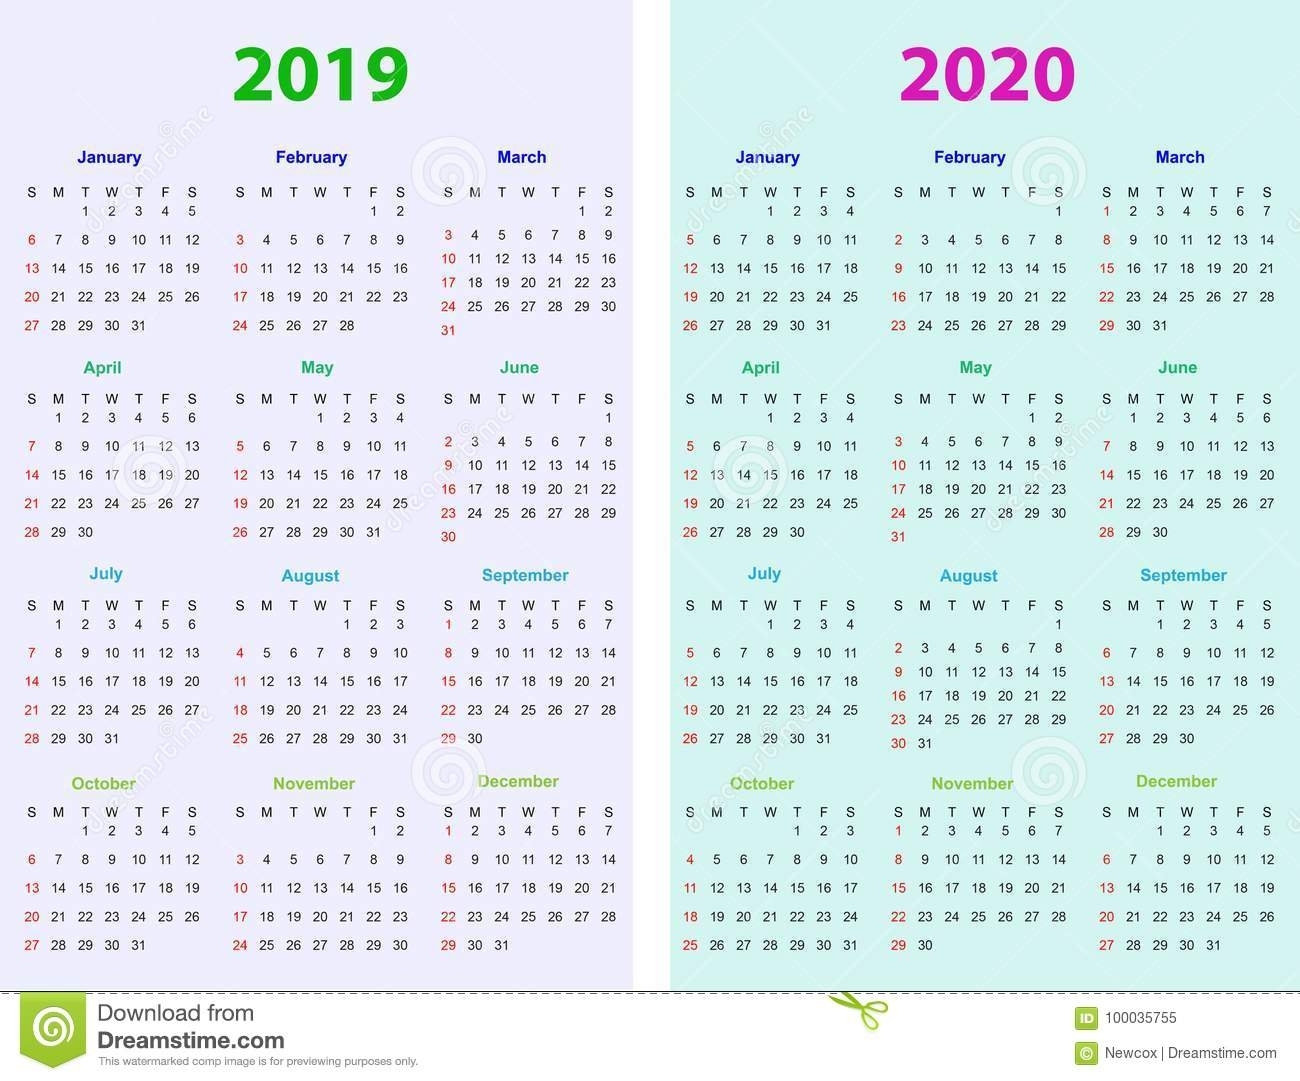 12 Months Calendar Design 2019-2020 Stock Vector - Illustration Of with regard to 2020 Printable Calendar 8.5 X 11 Free